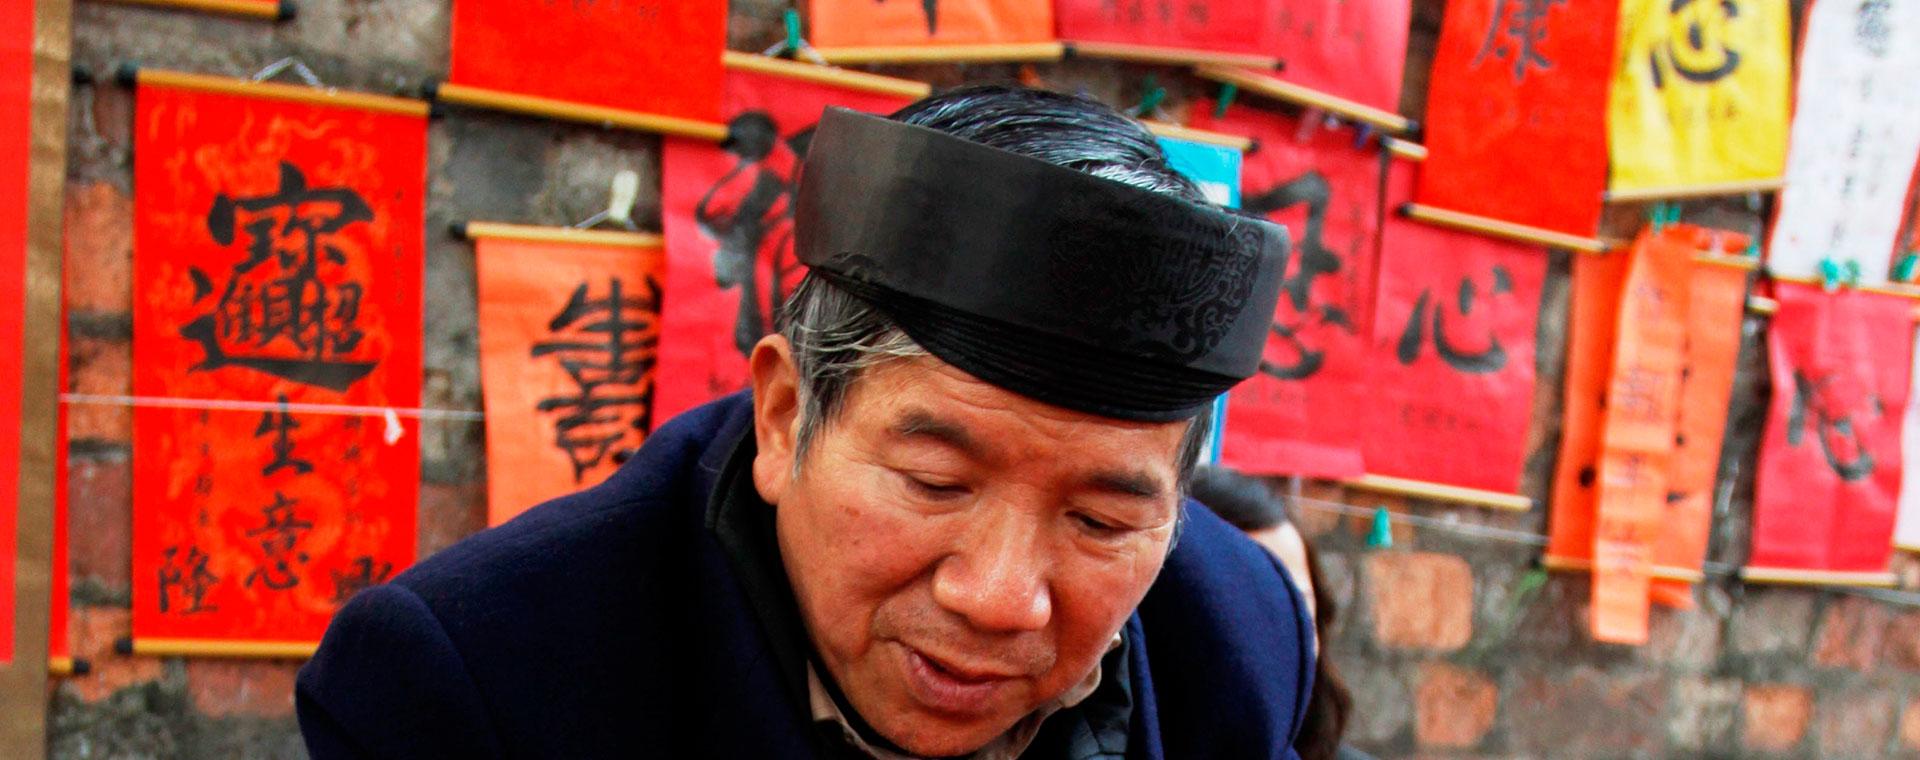 Tuyết ~ Rencontres & traditions vietnamiennes